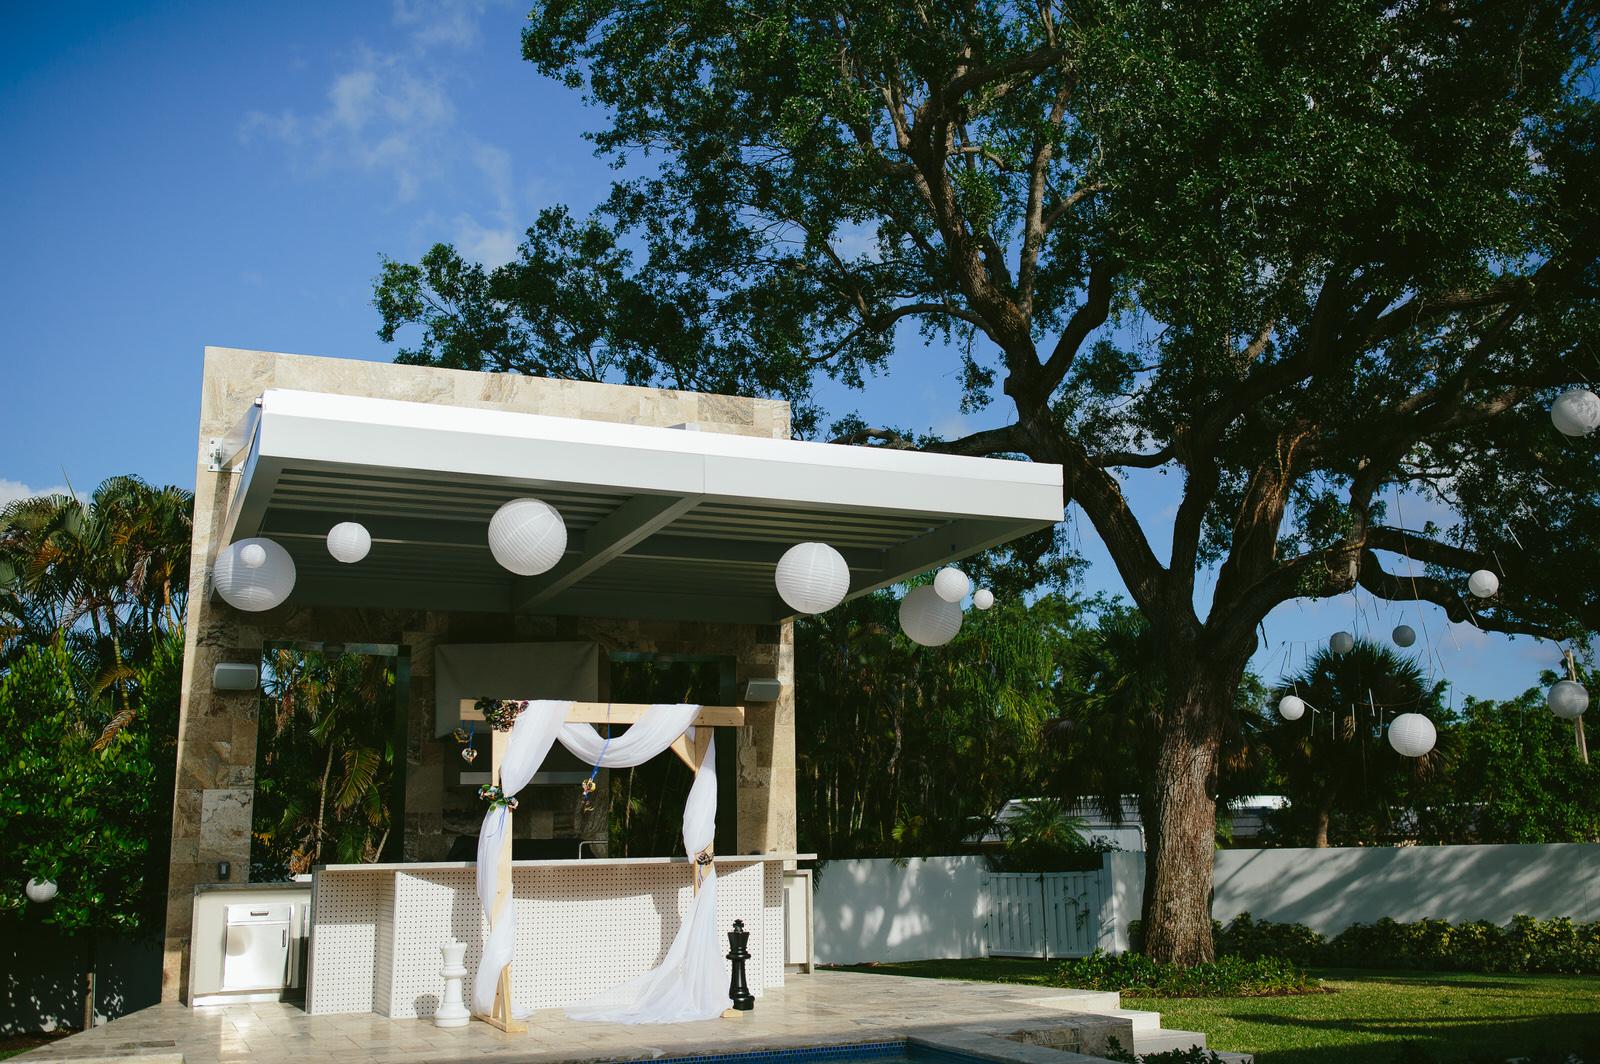 backyard-wedding-ceremony-tiny-house-photo.jpg